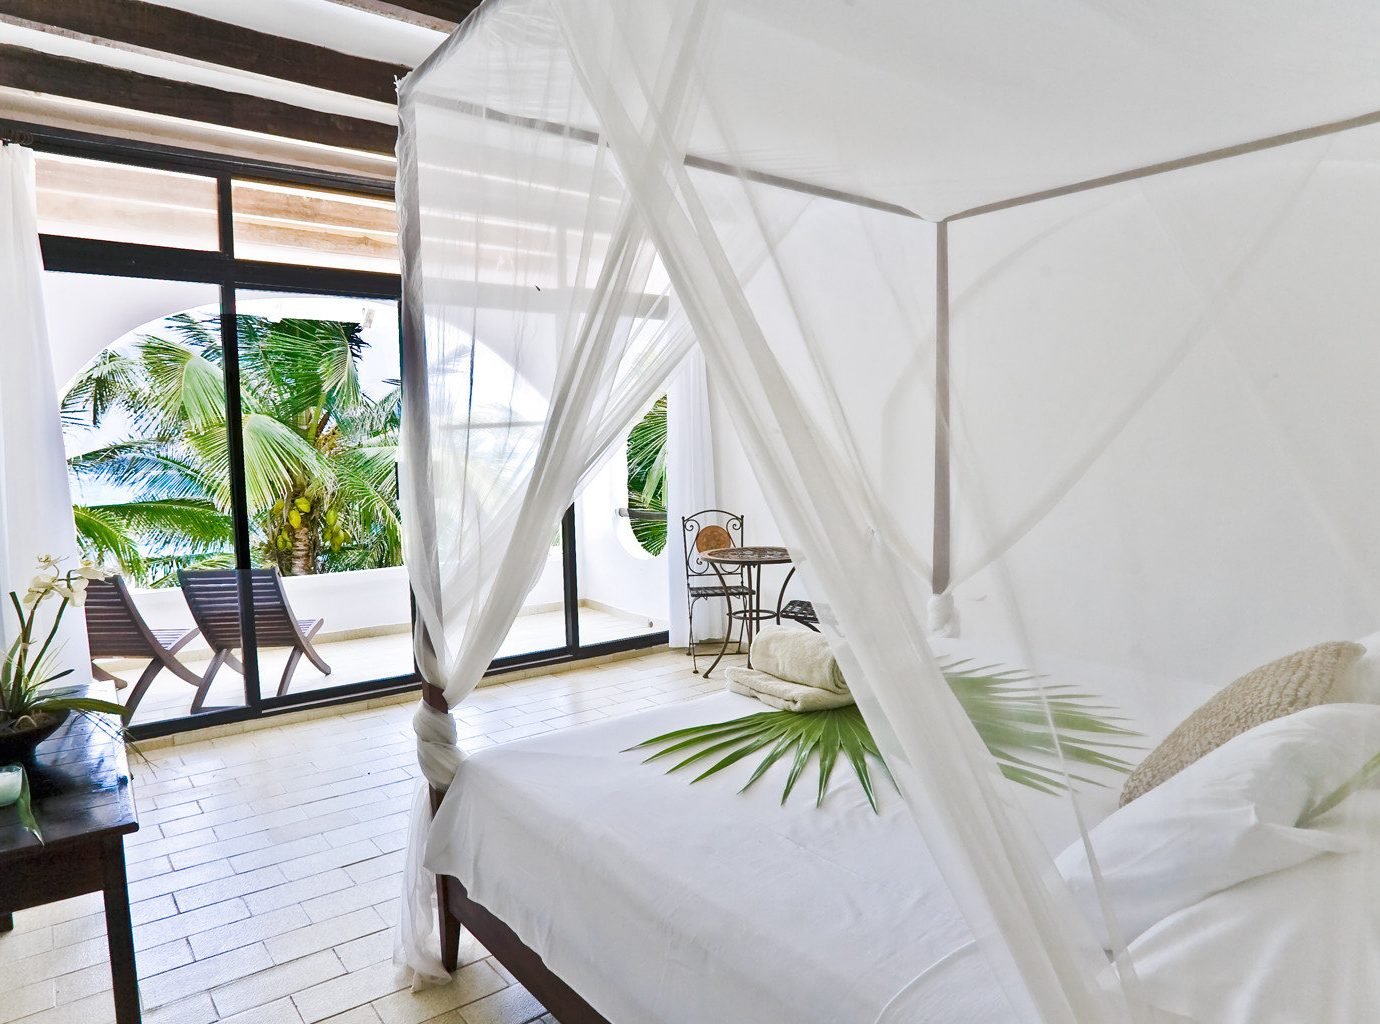 Bedroom Island Luxury Mexico Trip Ideas Waterfront Weekend Getaways indoor plant property room window interior design estate real estate Villa furniture